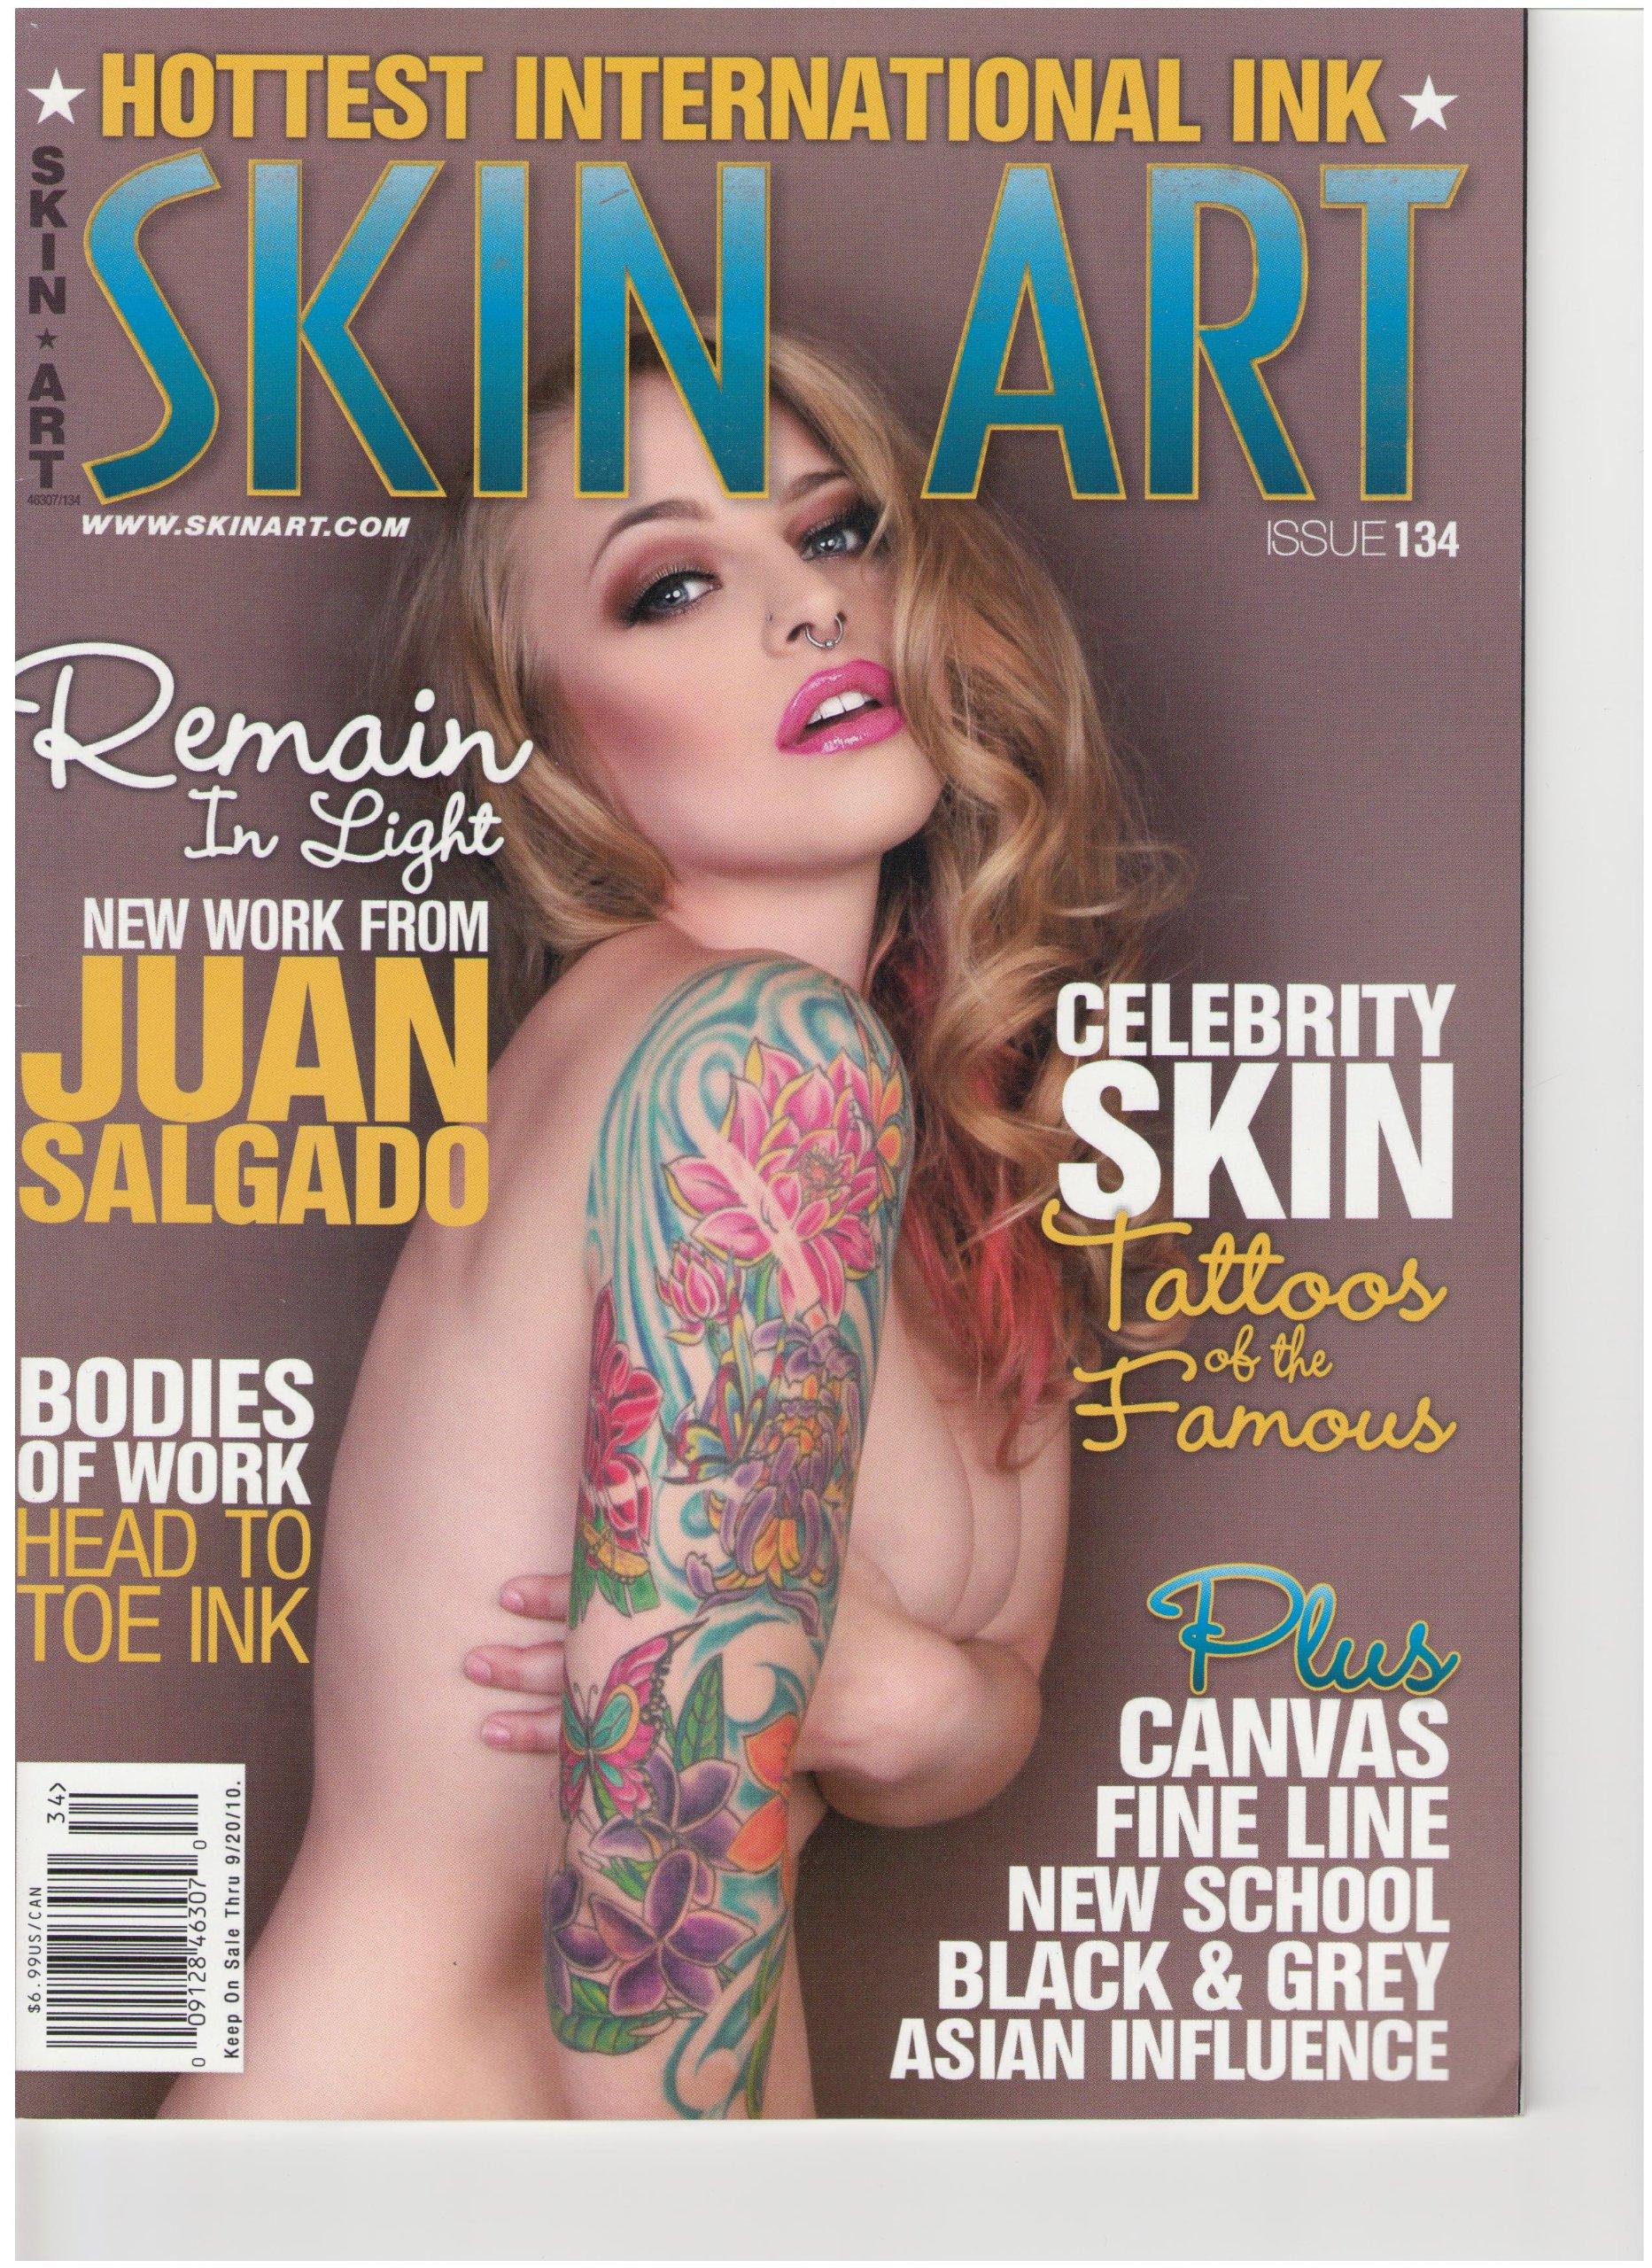 Download Skin Art Magazine (Celebrity skin Tattoos of the famous, September 2010) pdf